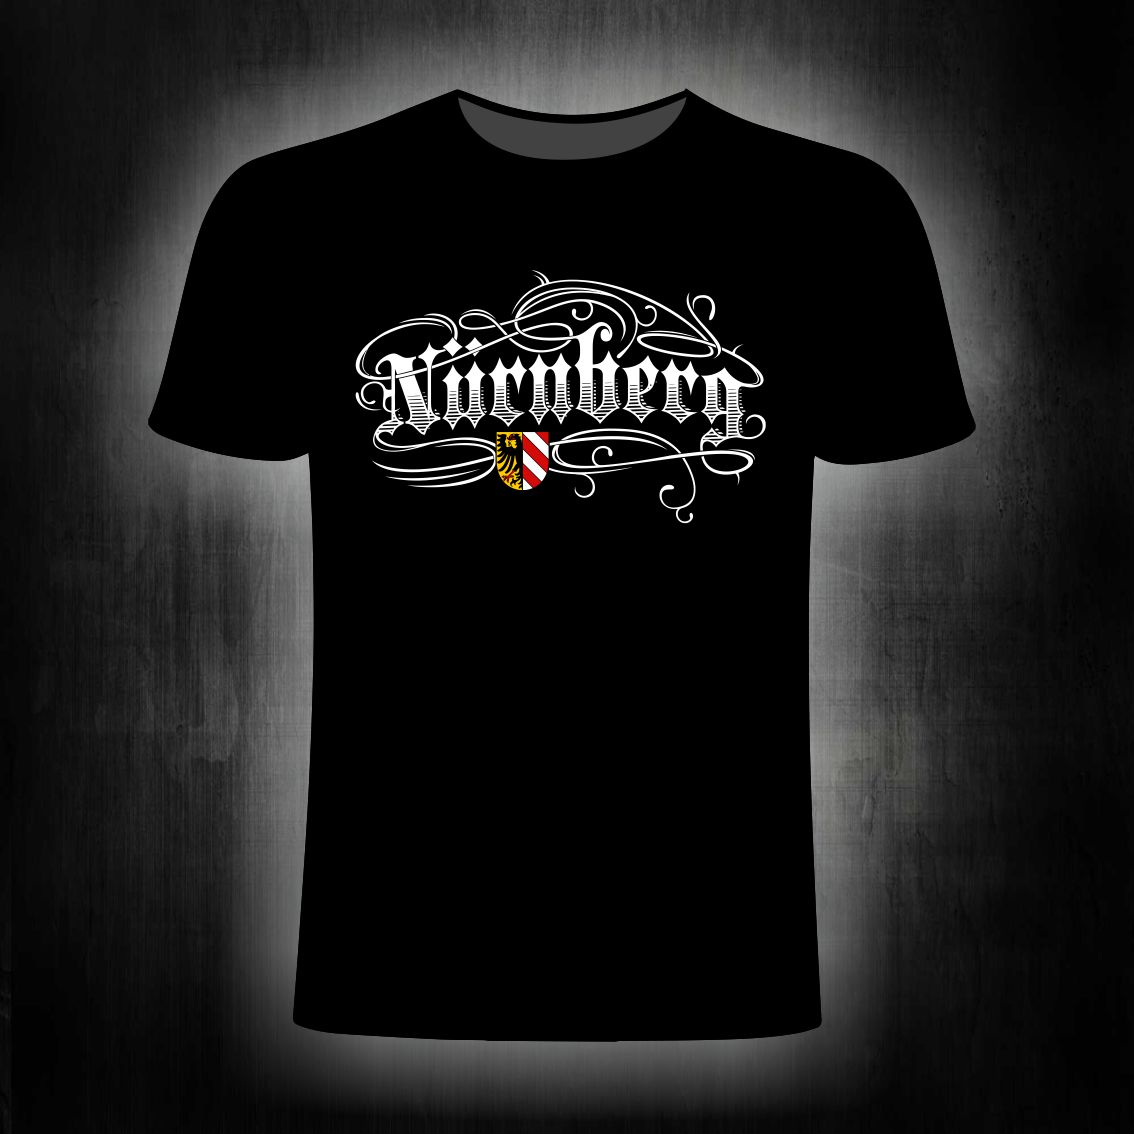 T-Shirt einseitig bedruckt  Tattoo Style